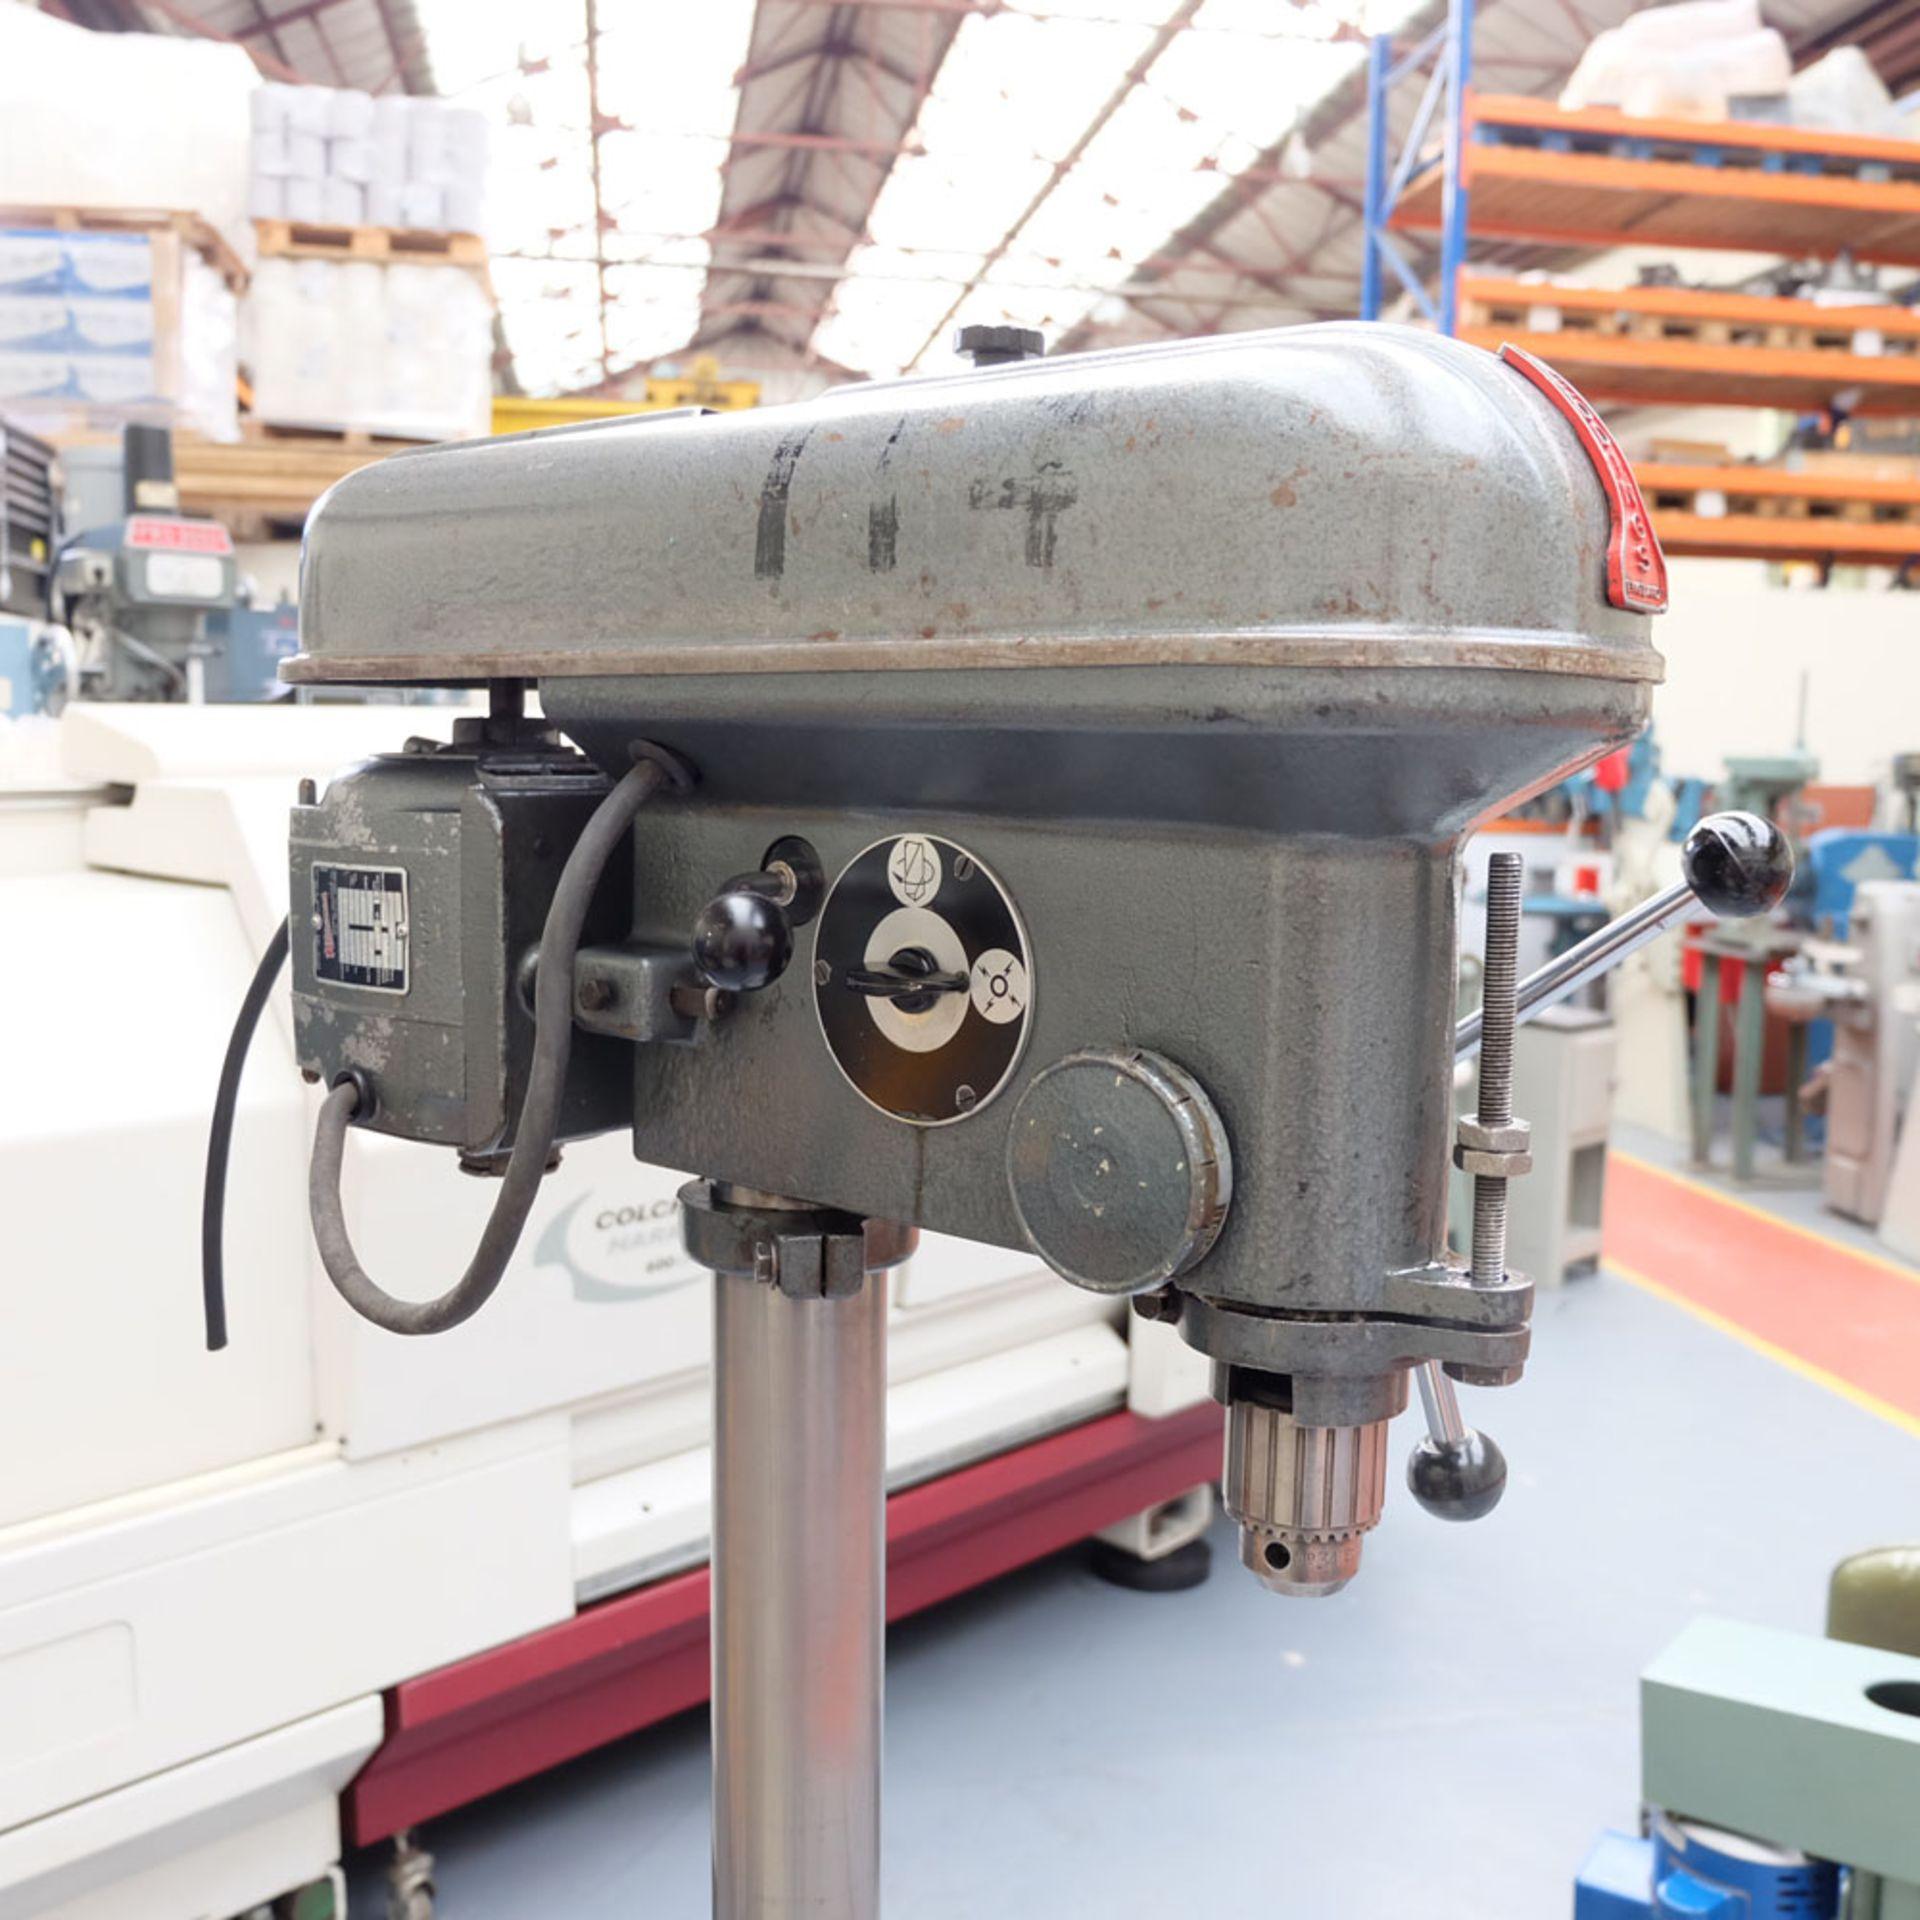 "Meddings Type Driltru Pillar Drill. Capacity 1/2"". 5 Speeds 500 - 4000rpm. - Image 3 of 7"